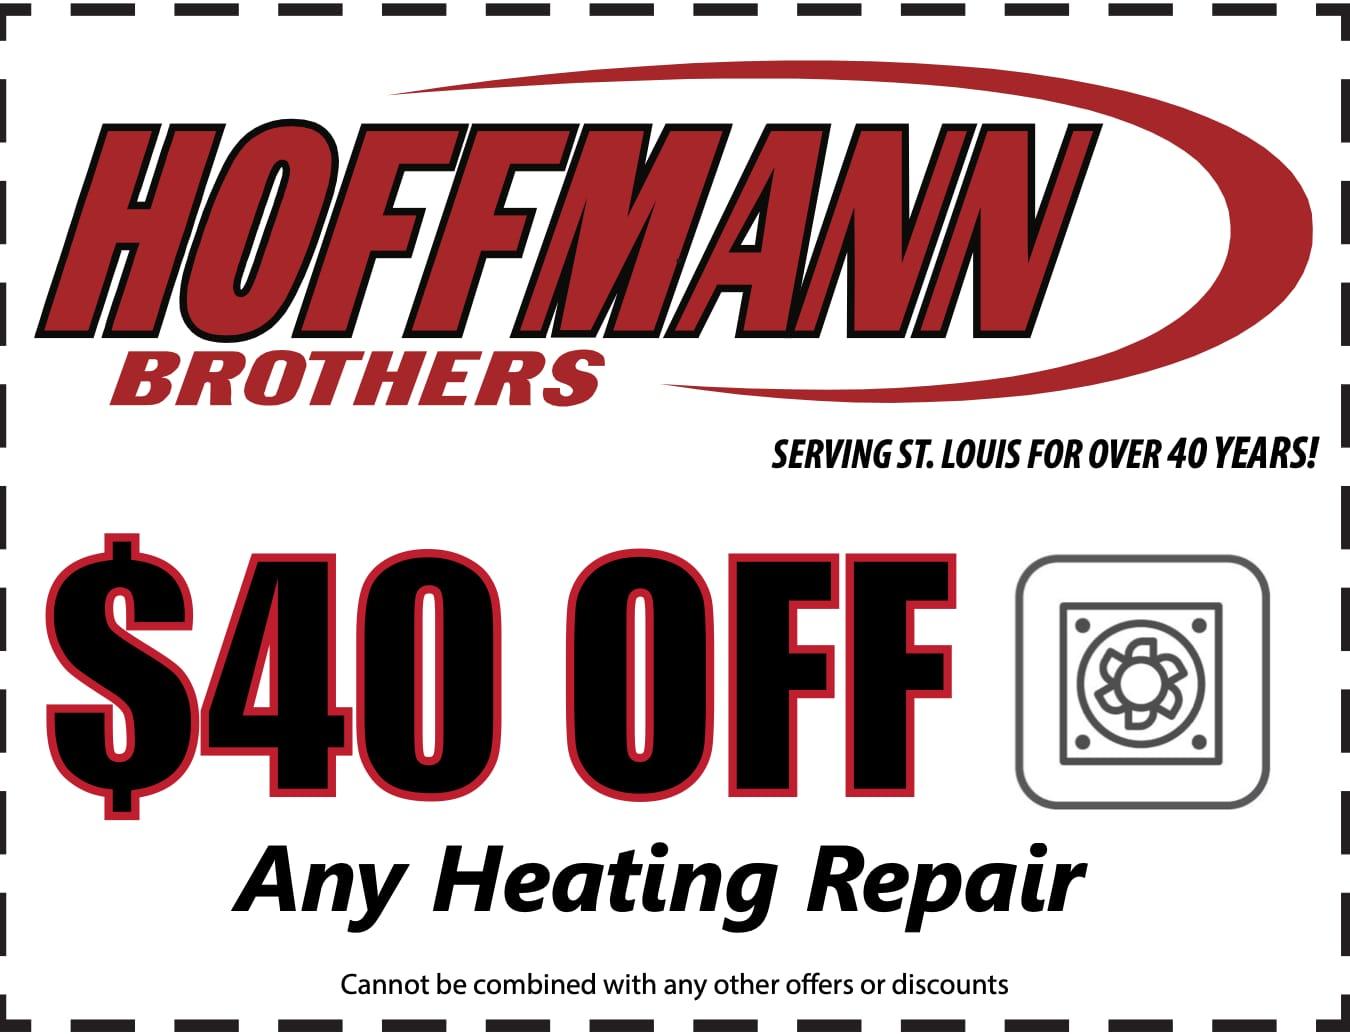 $40 off any heating repair coupon